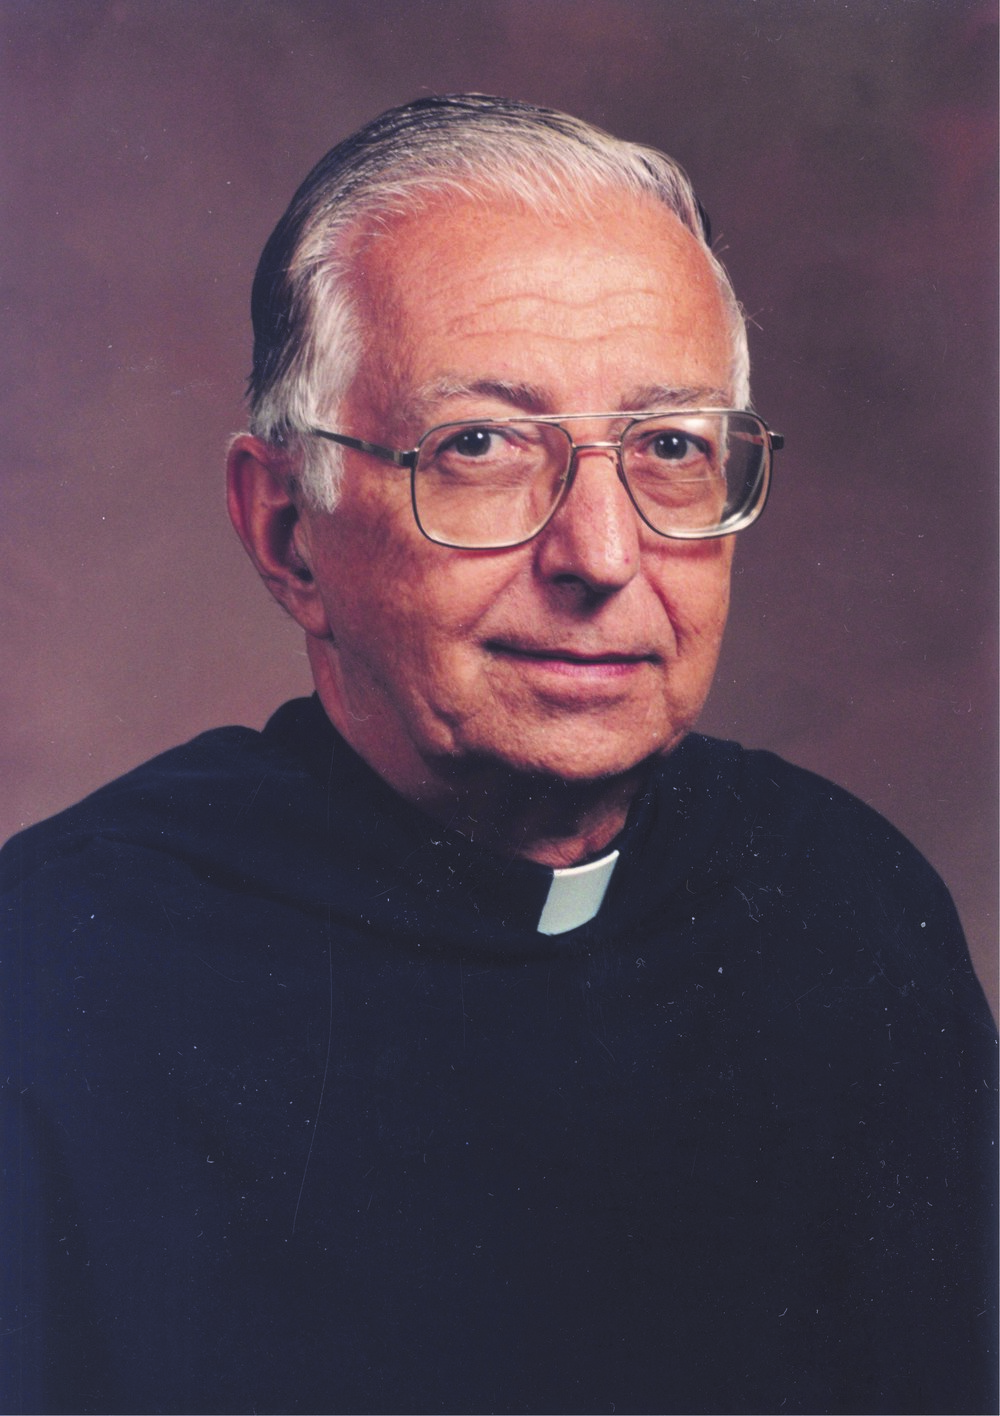 Father Dick Appicci, O.S.A., 1928-2007